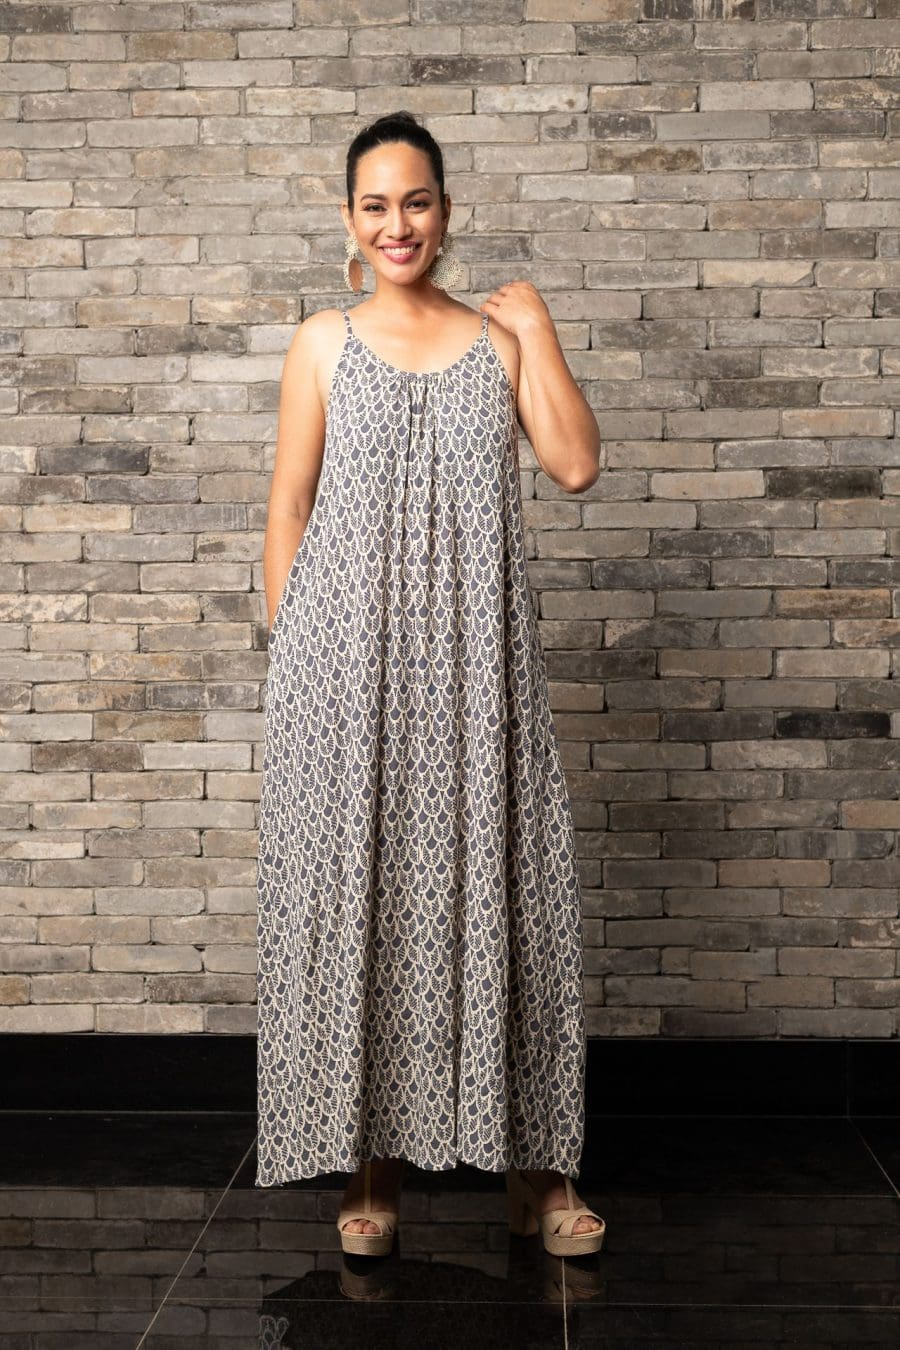 Model wearing Lei Dress in Pavement Moonbeam Palulu Pattern - Front View